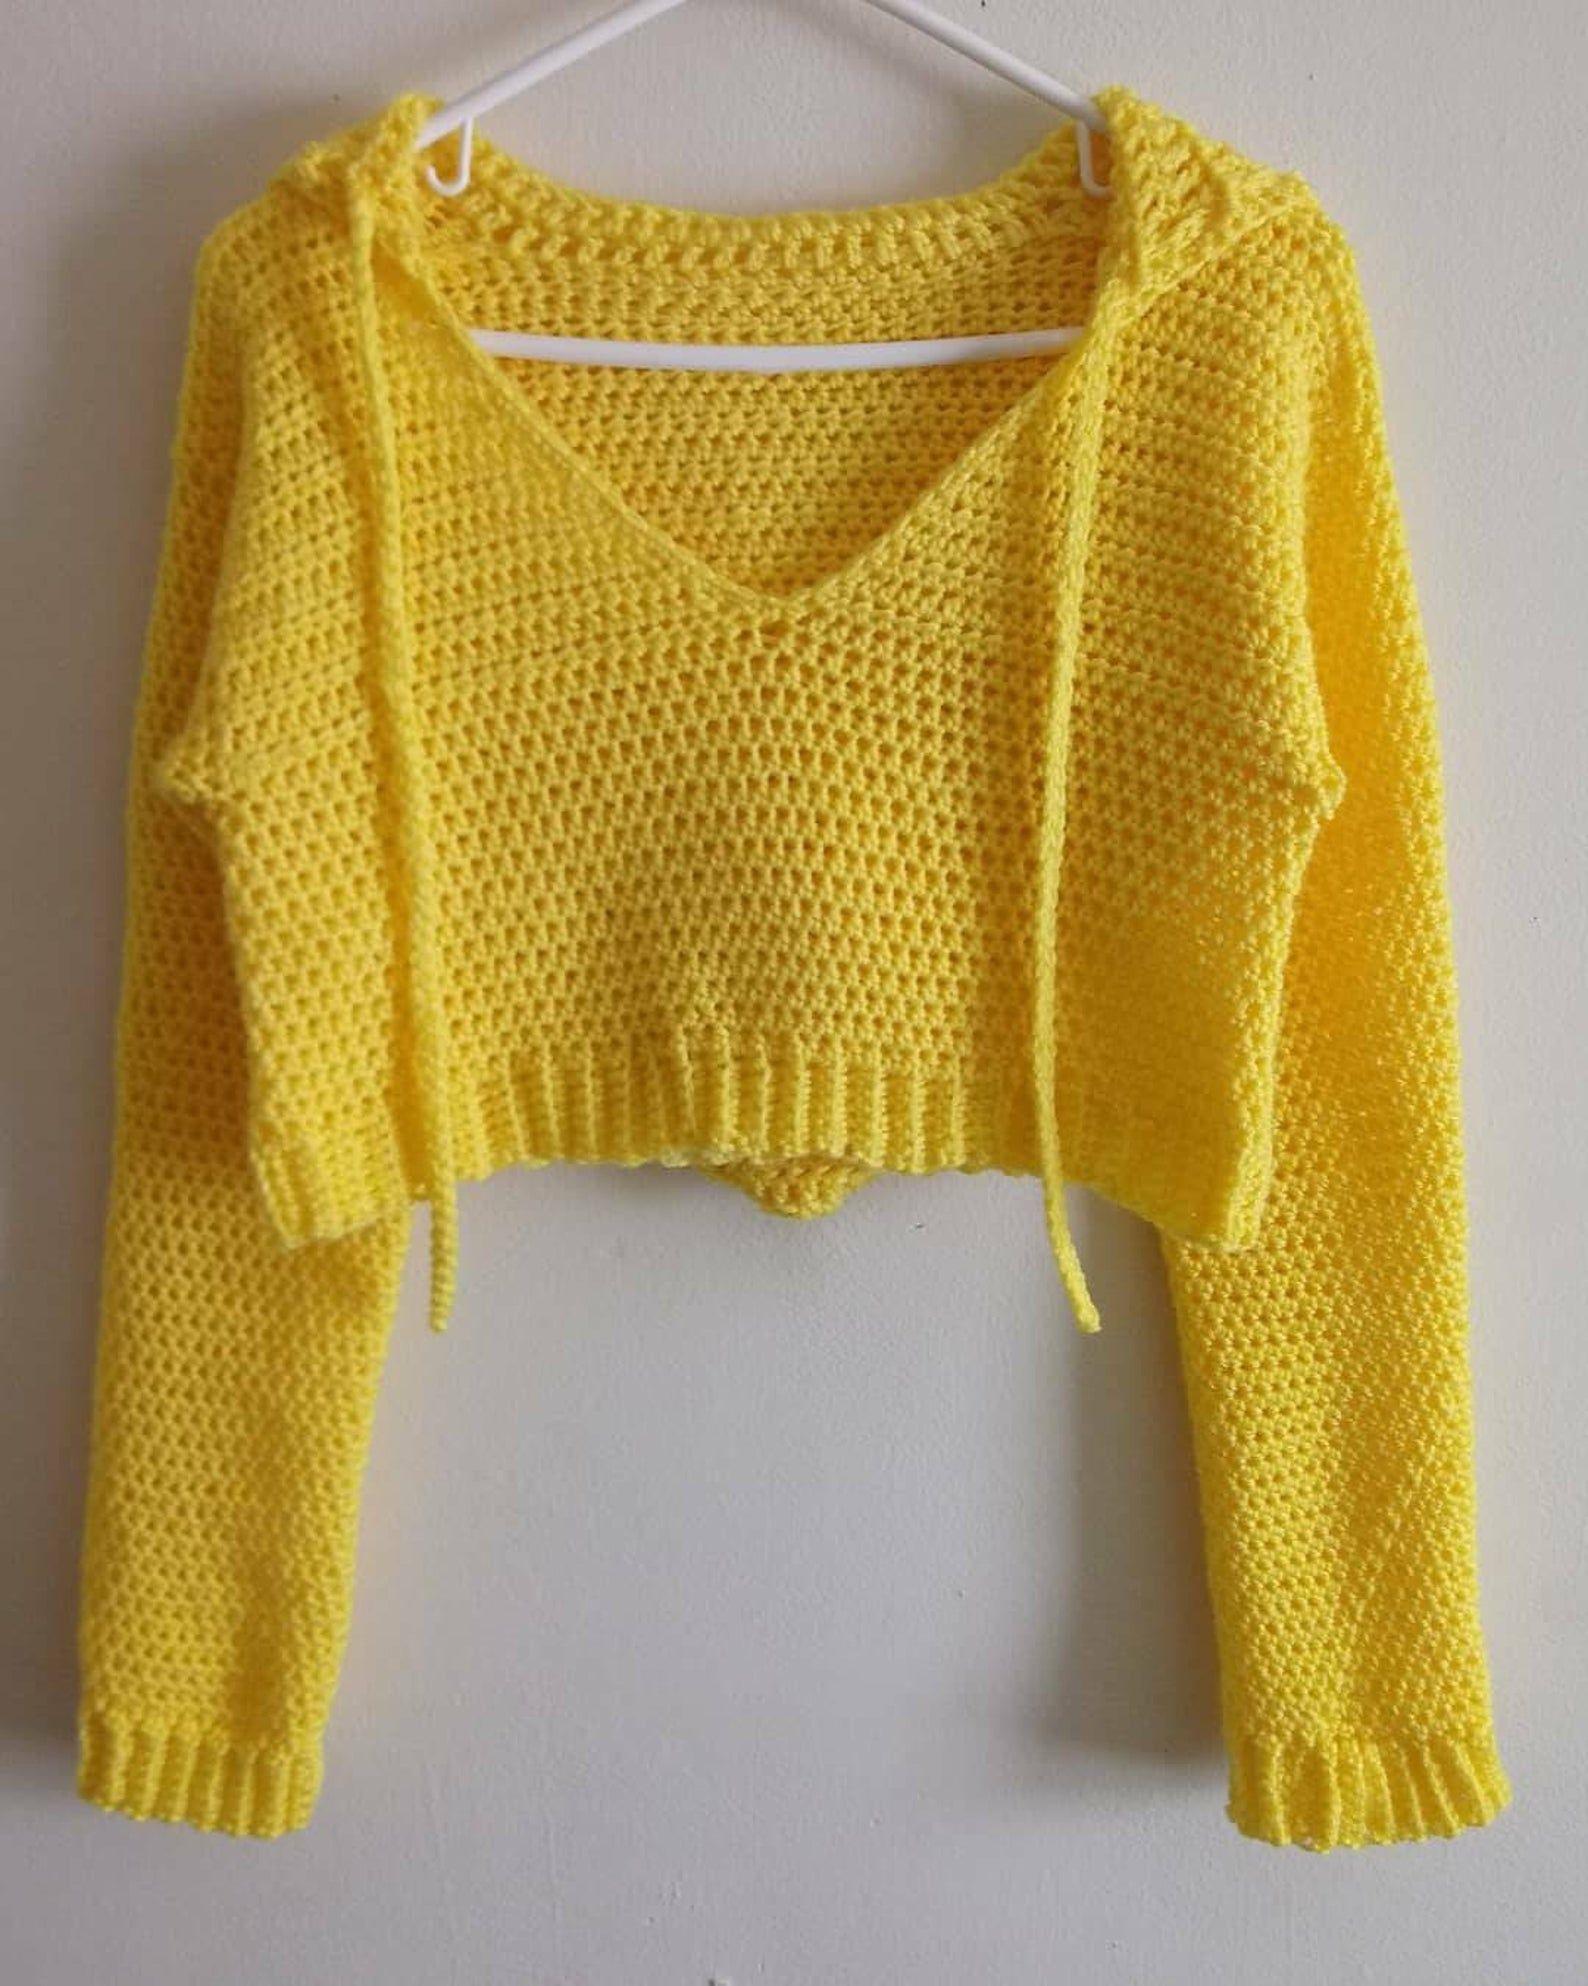 17 diy Clothes sweater ideas